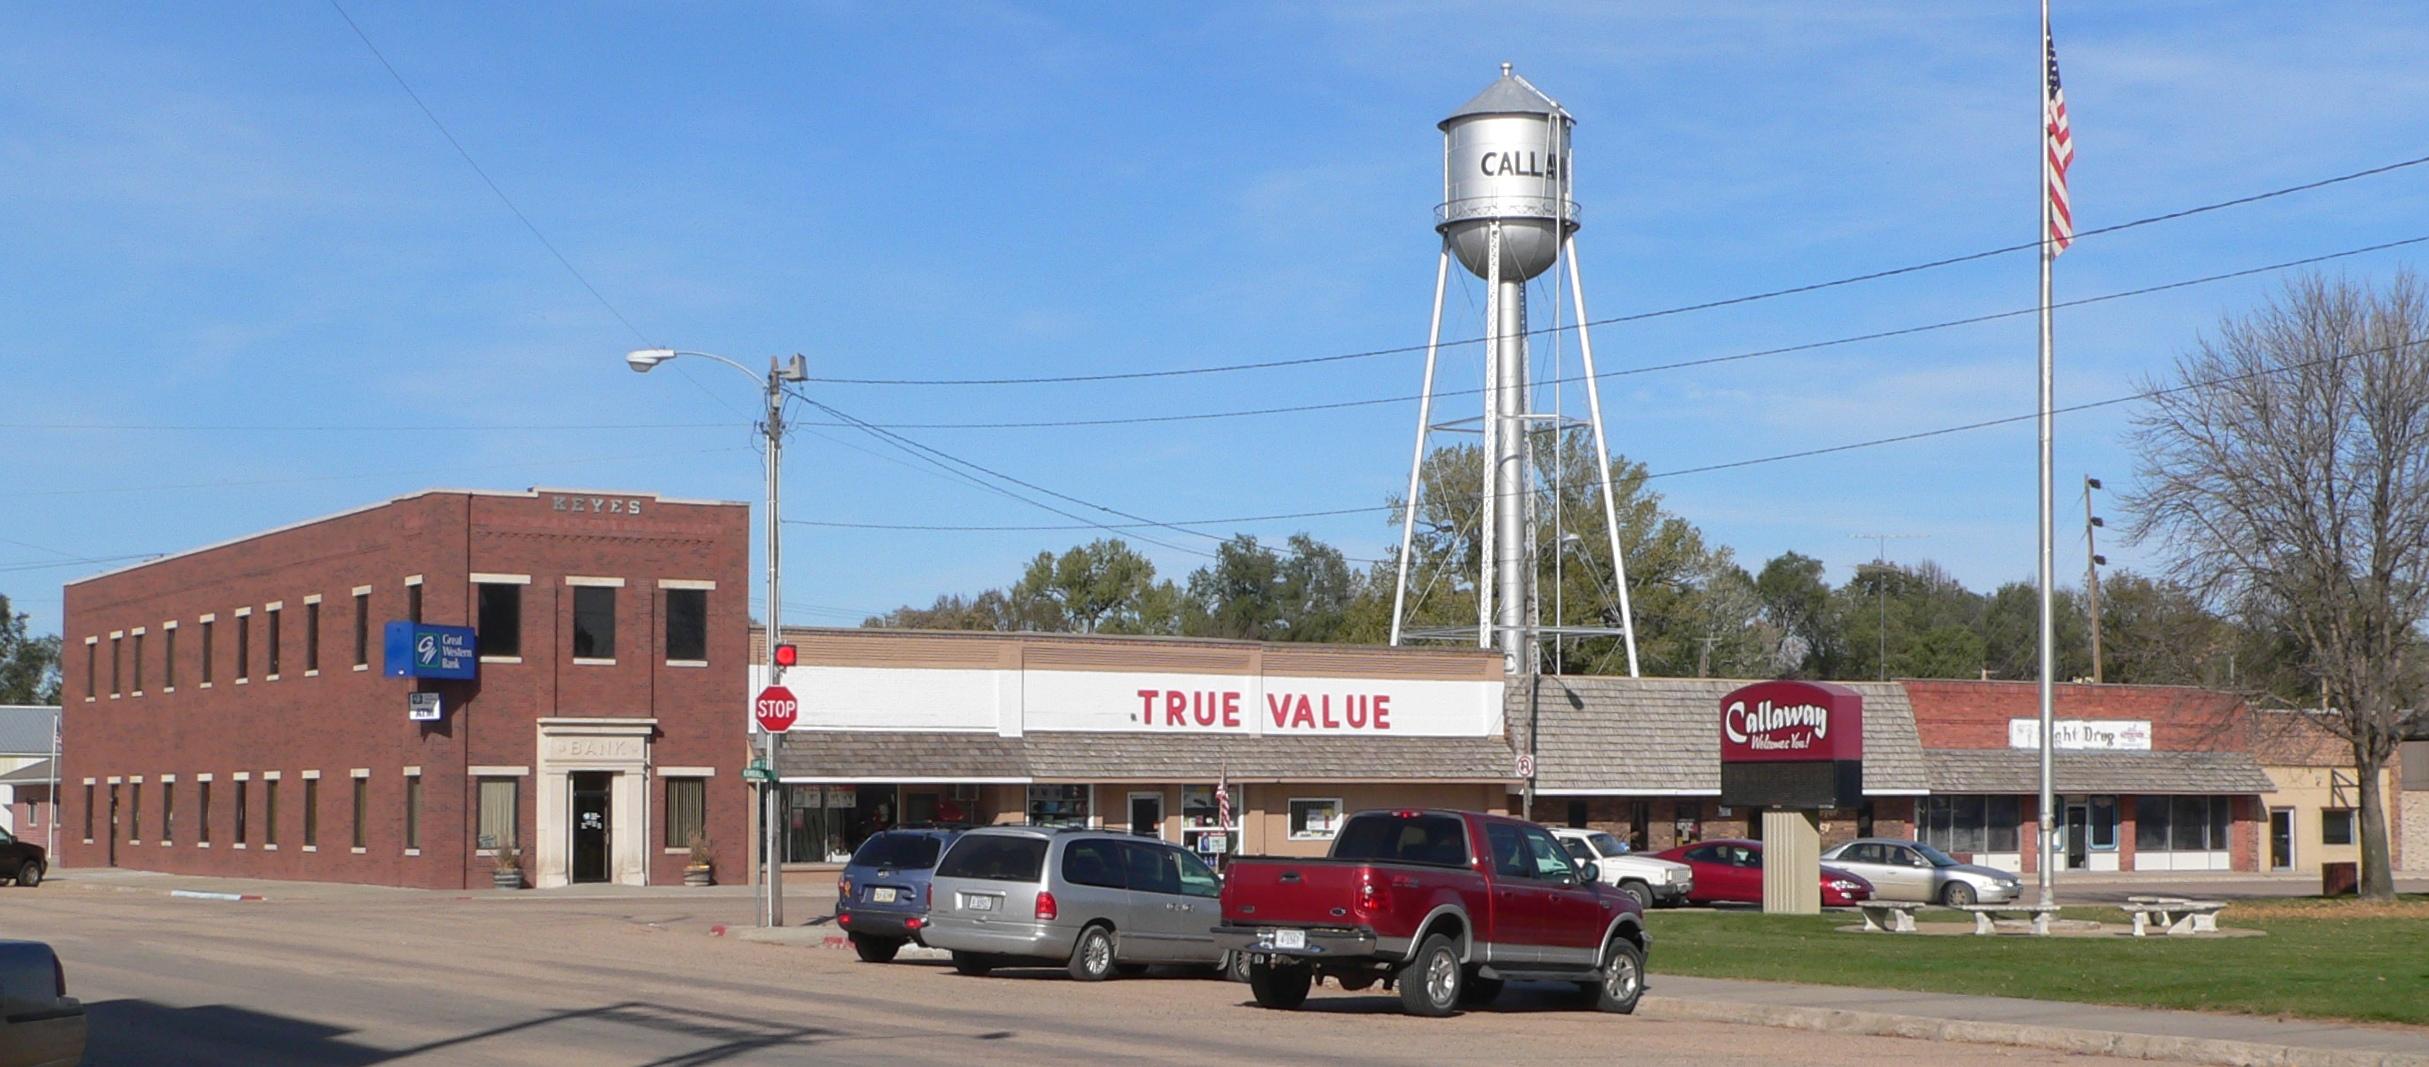 Callaway Funeral Homes Funeral Services Flowers In Nebraska